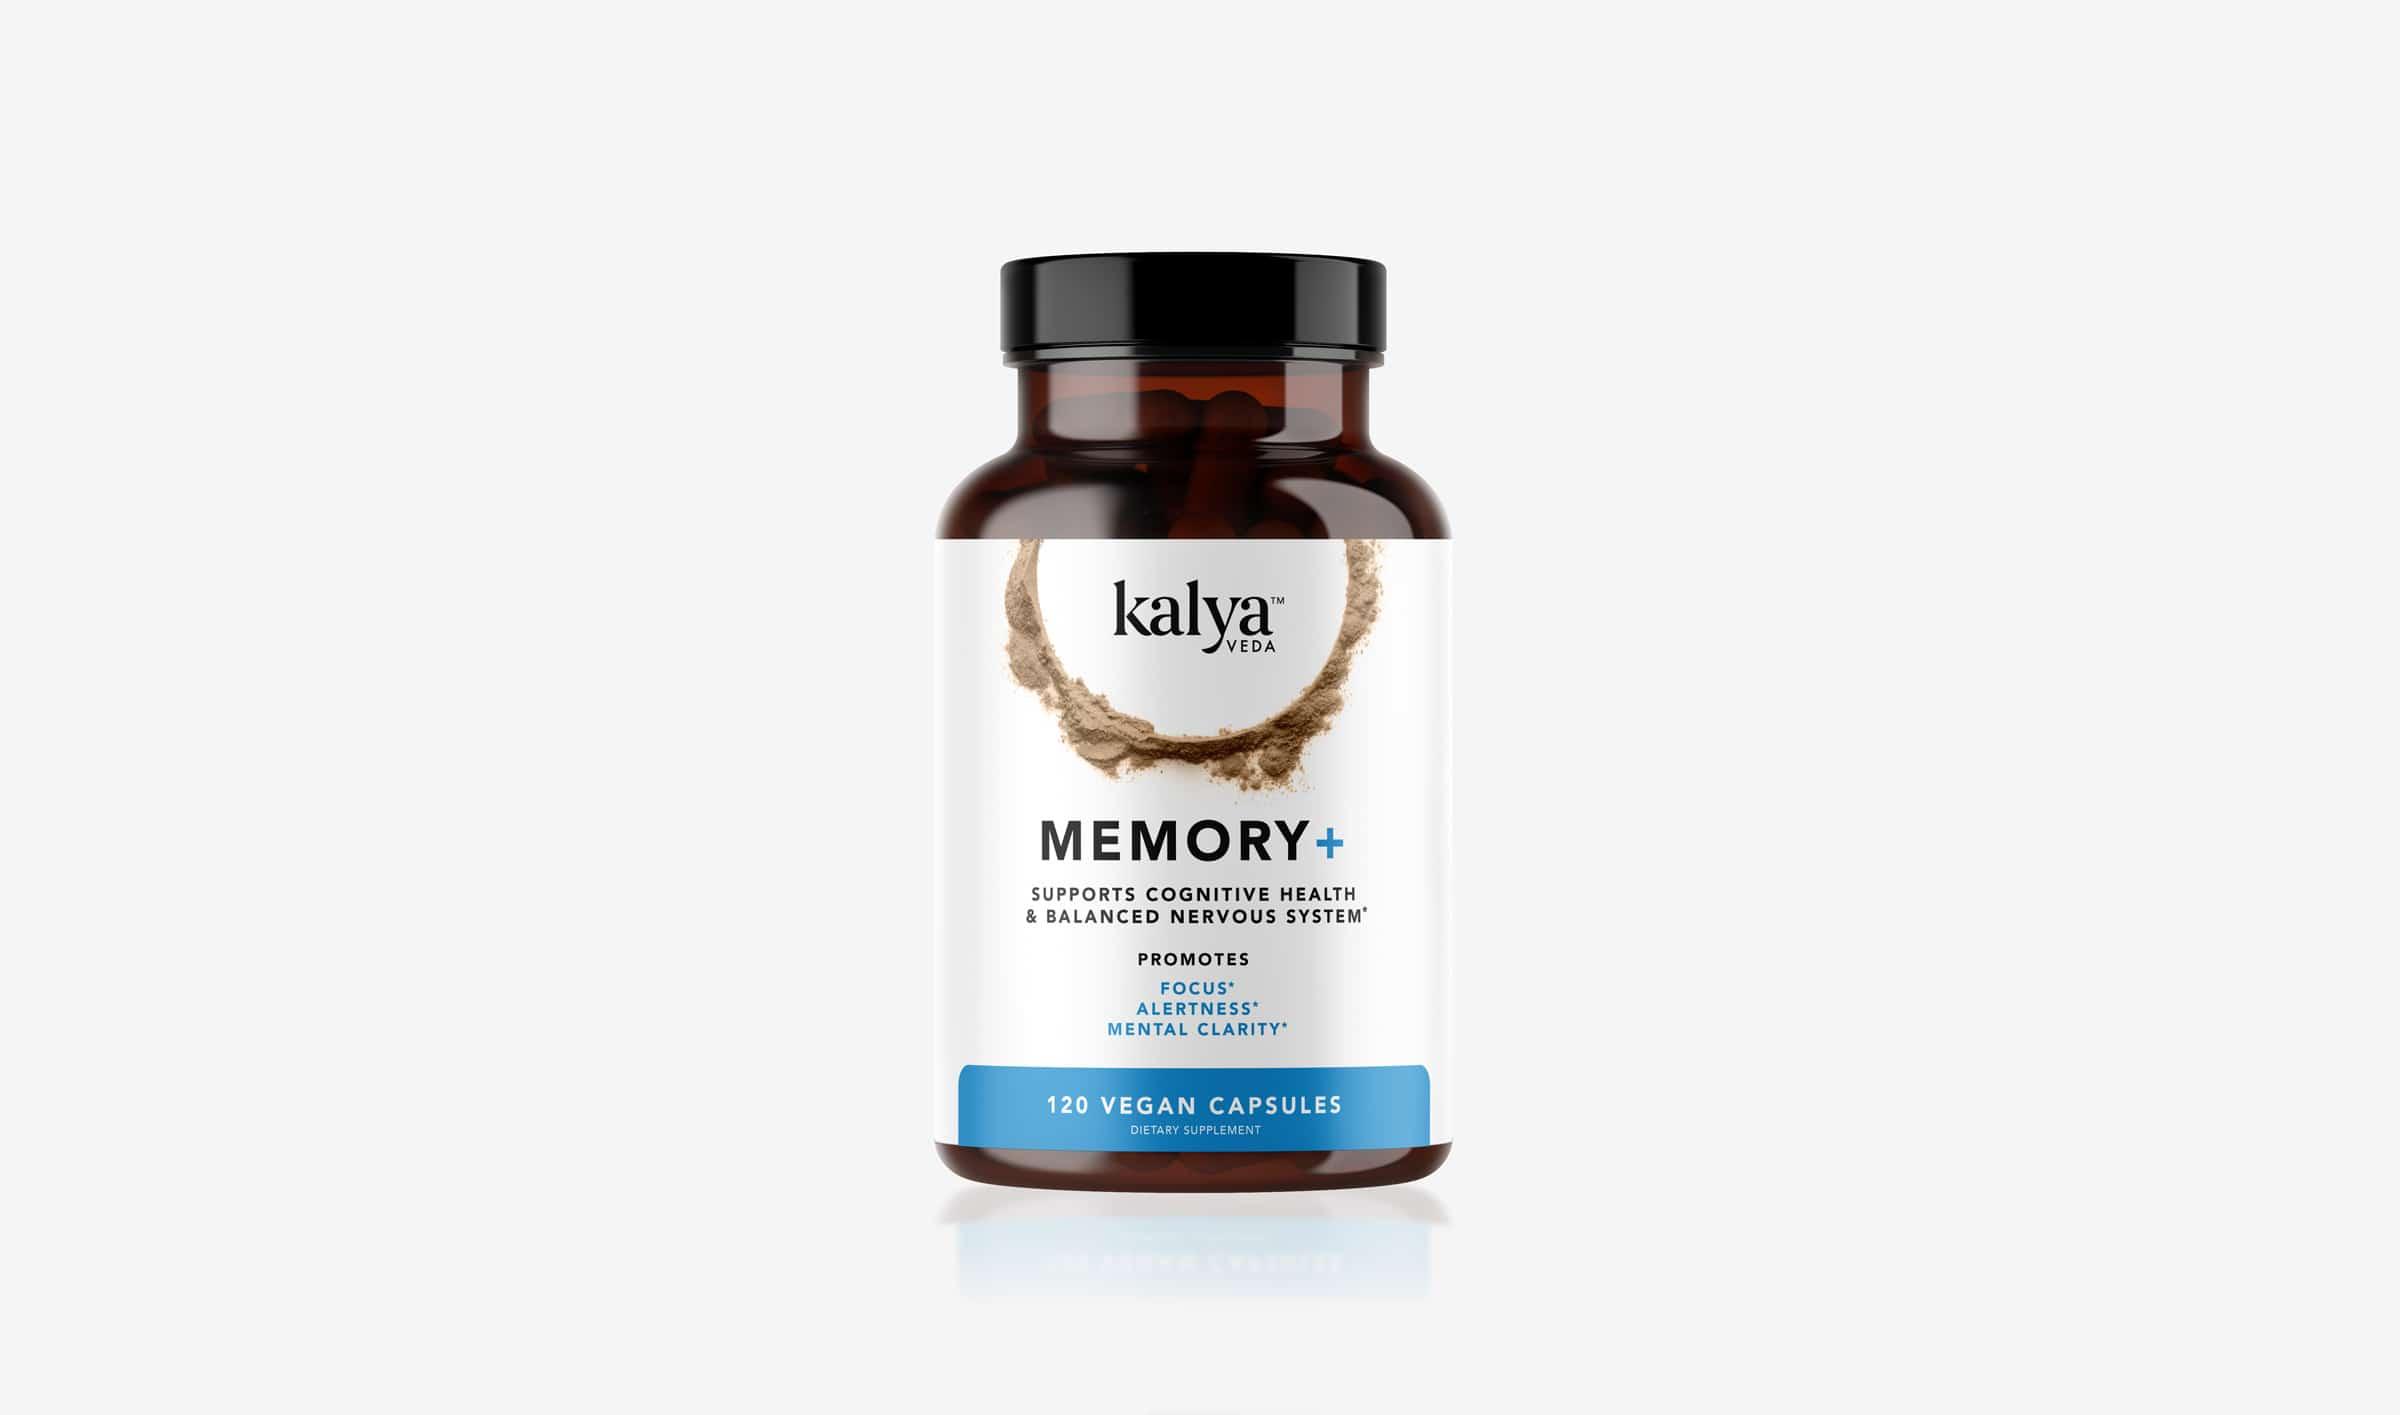 MemoryPlus-Bottle-2400x1415